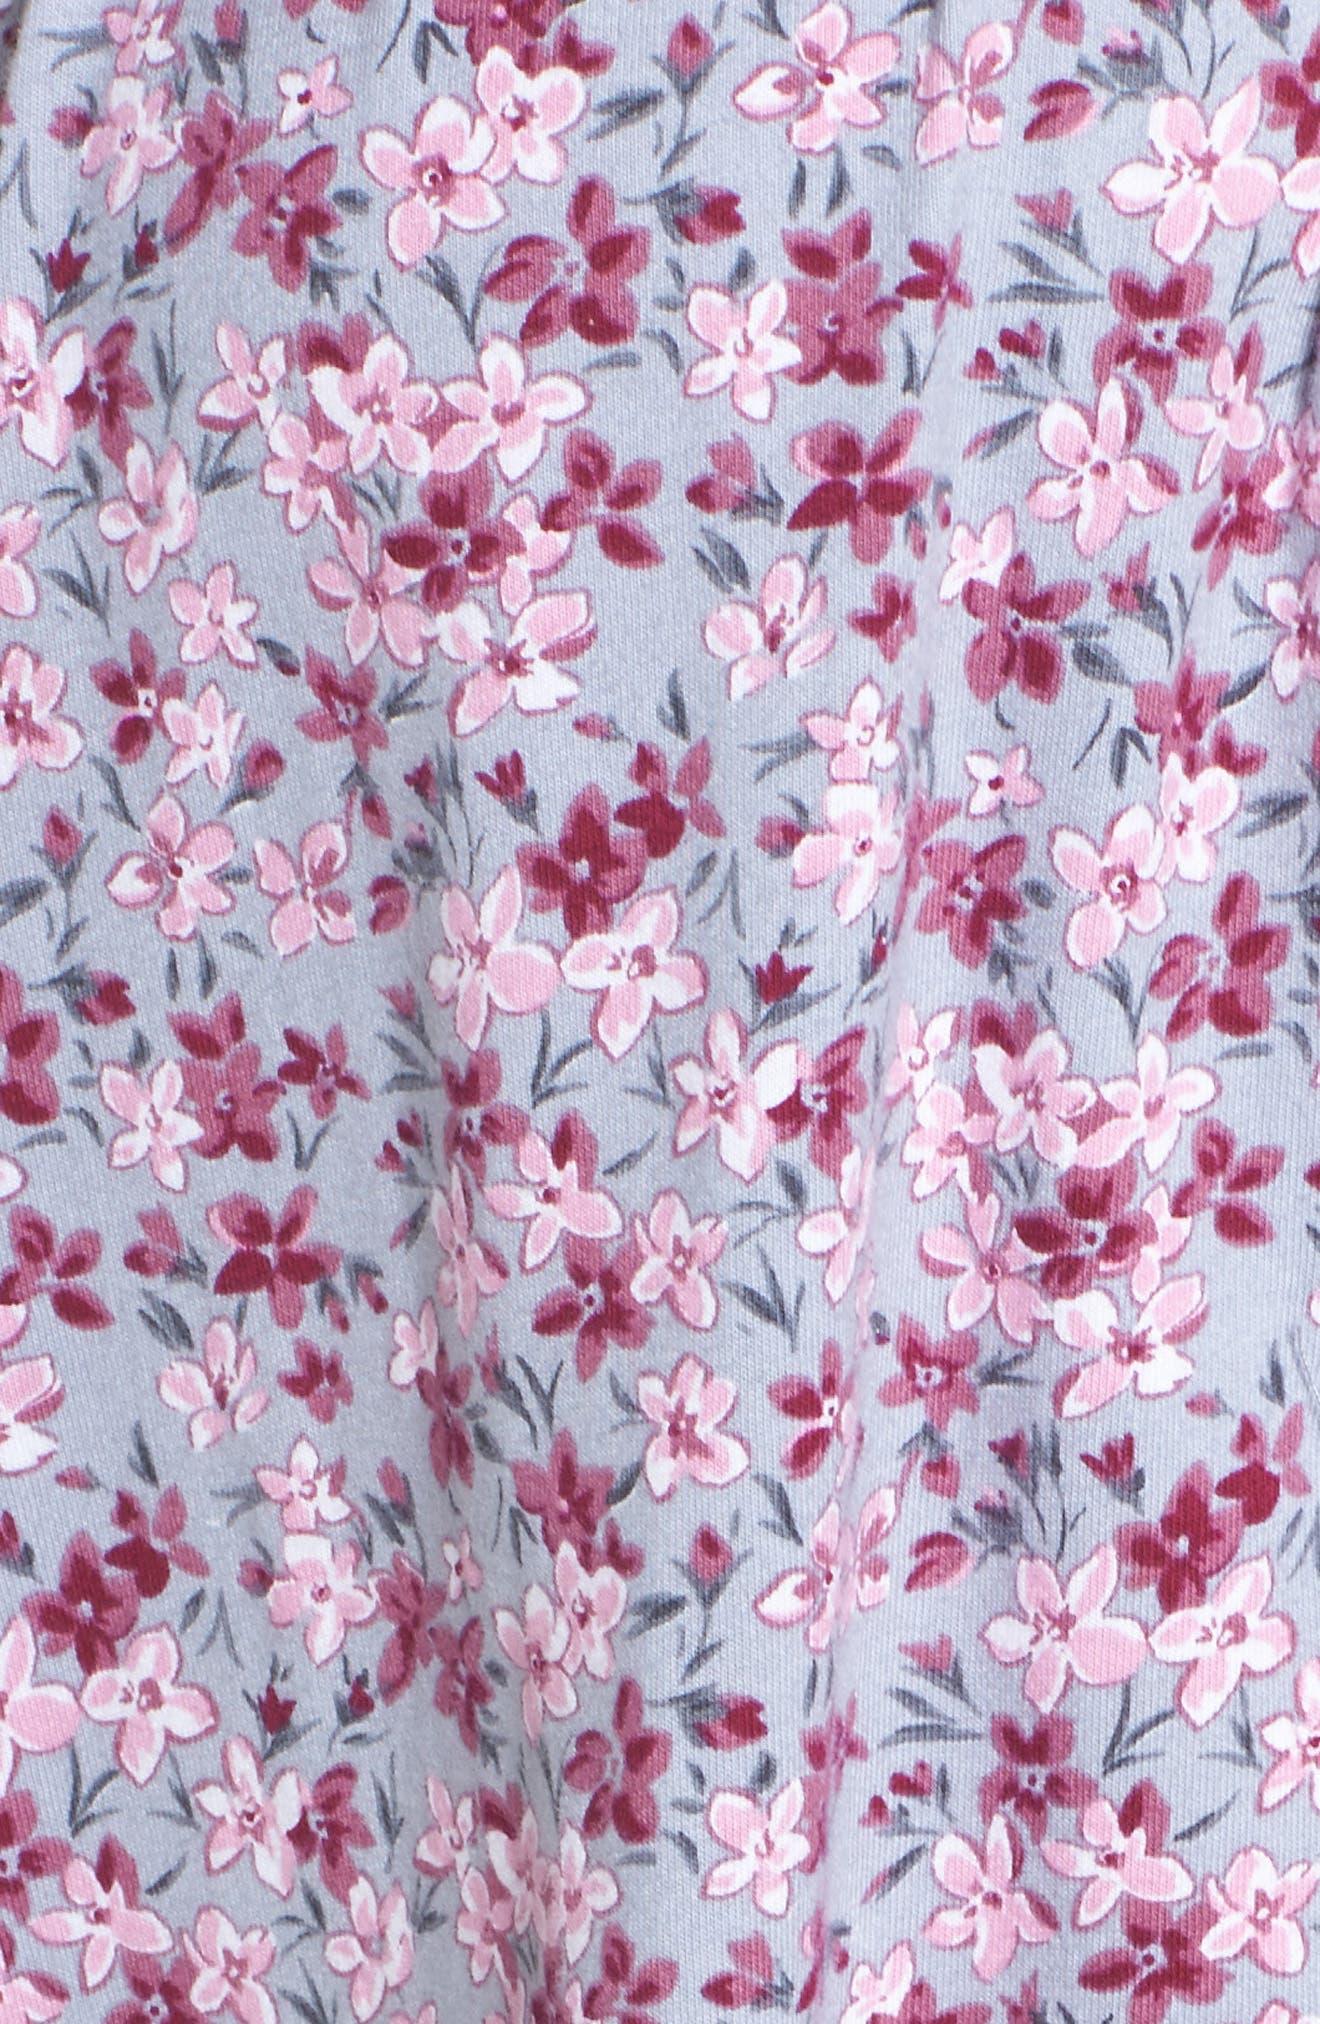 Floral Print Waltz Nightgown,                             Alternate thumbnail 5, color,                             020